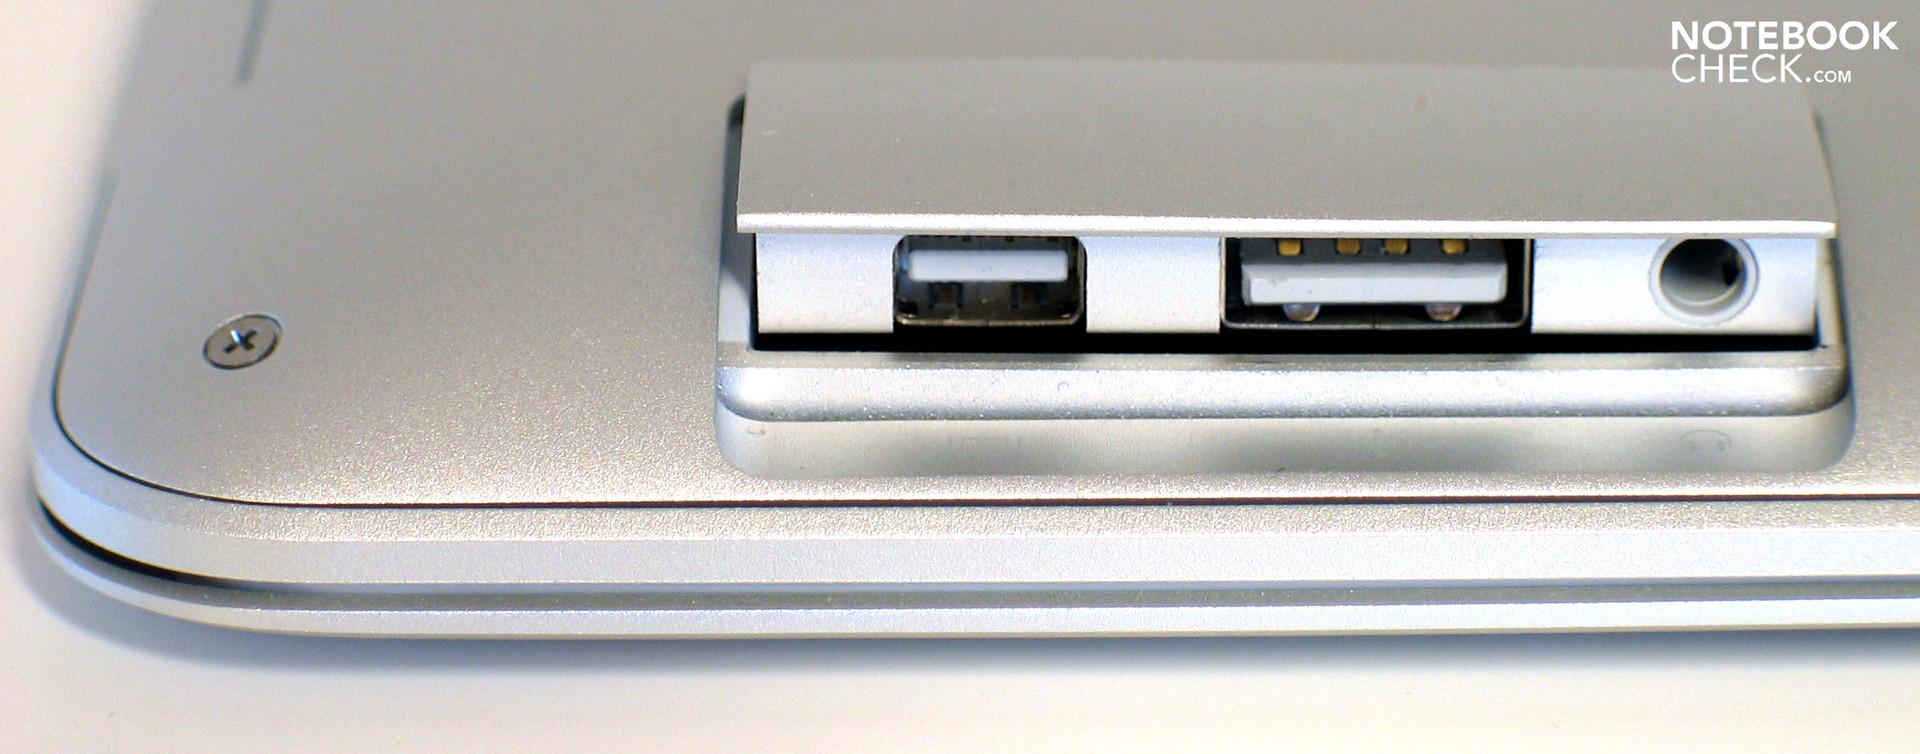 Review Apple Macbook Air Mid 2009 Mc234 A